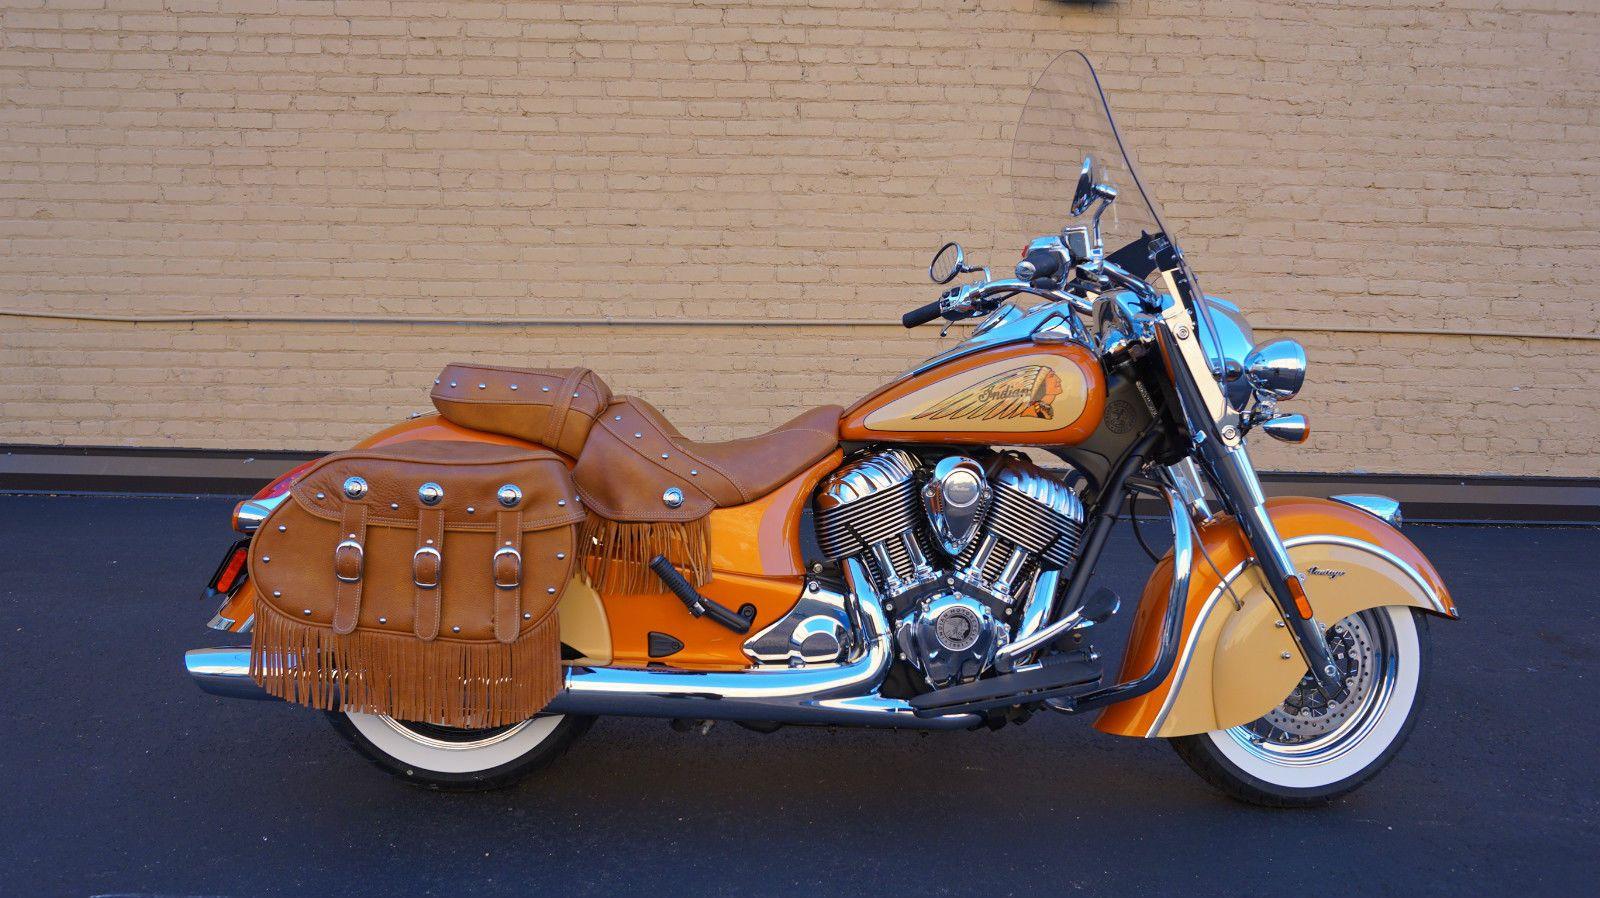 Us 22 399 99 New In Ebay Motors Motorcycles Indian Vintage Indian Motorcycles Vintage Motorcycles Motorcycle